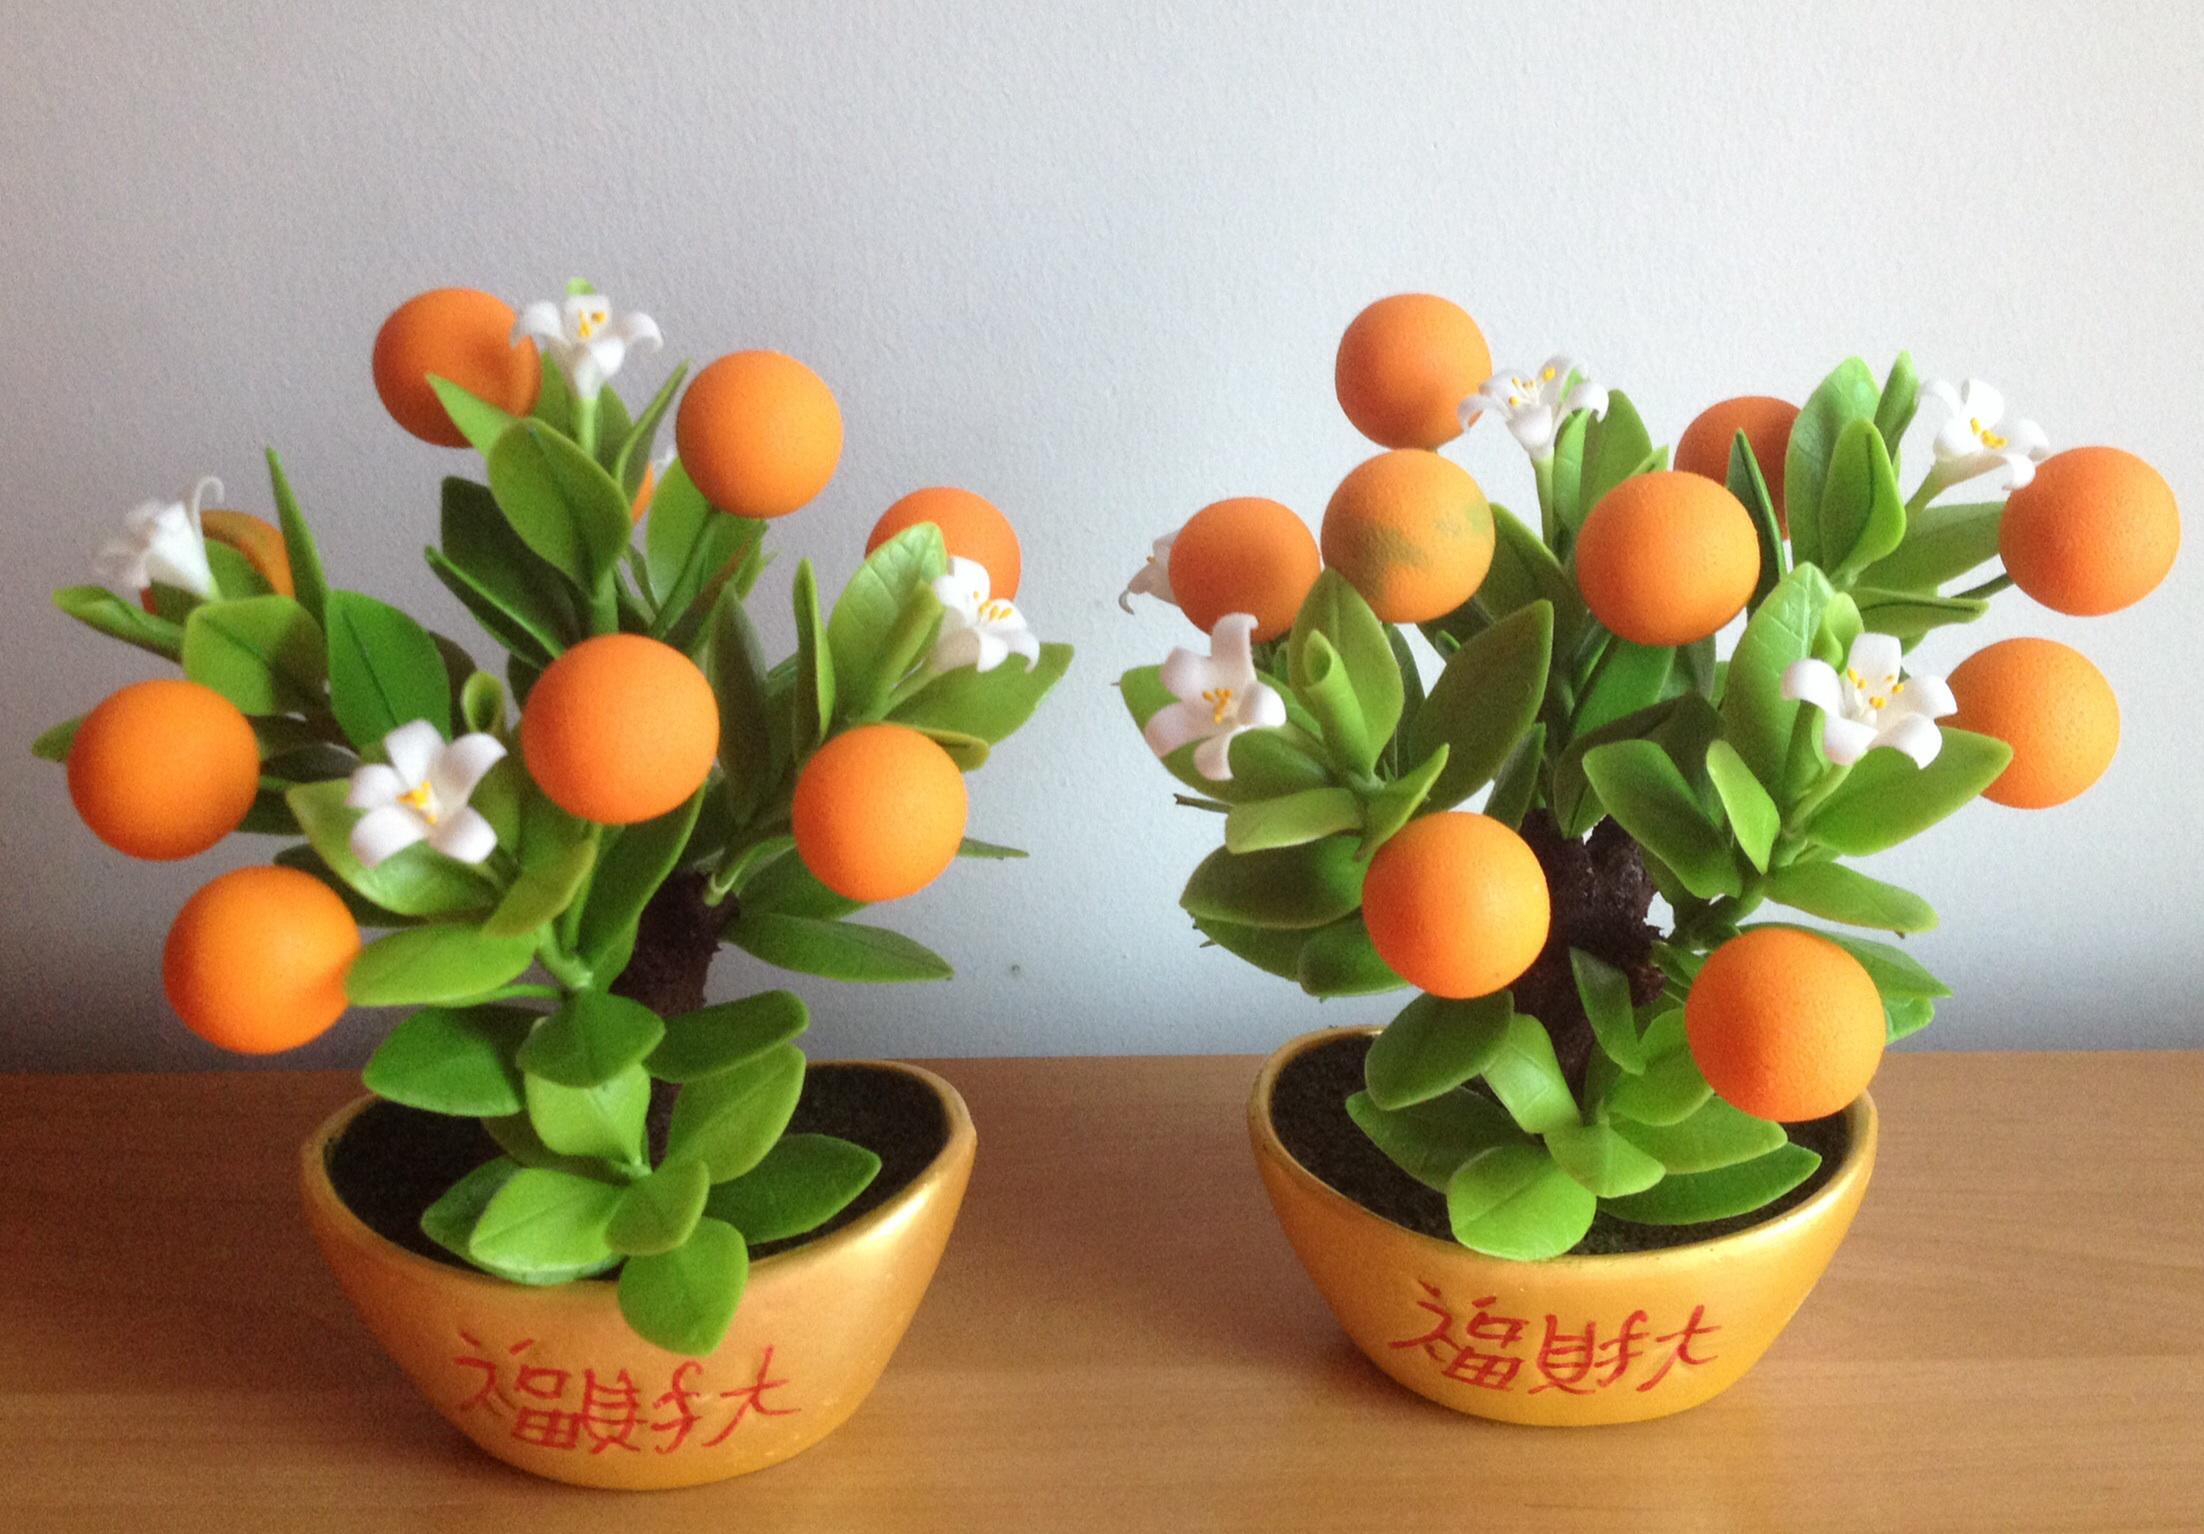 S006-ต้นส้มสูง 6 นิ้ว จำนวน 9 ลูก